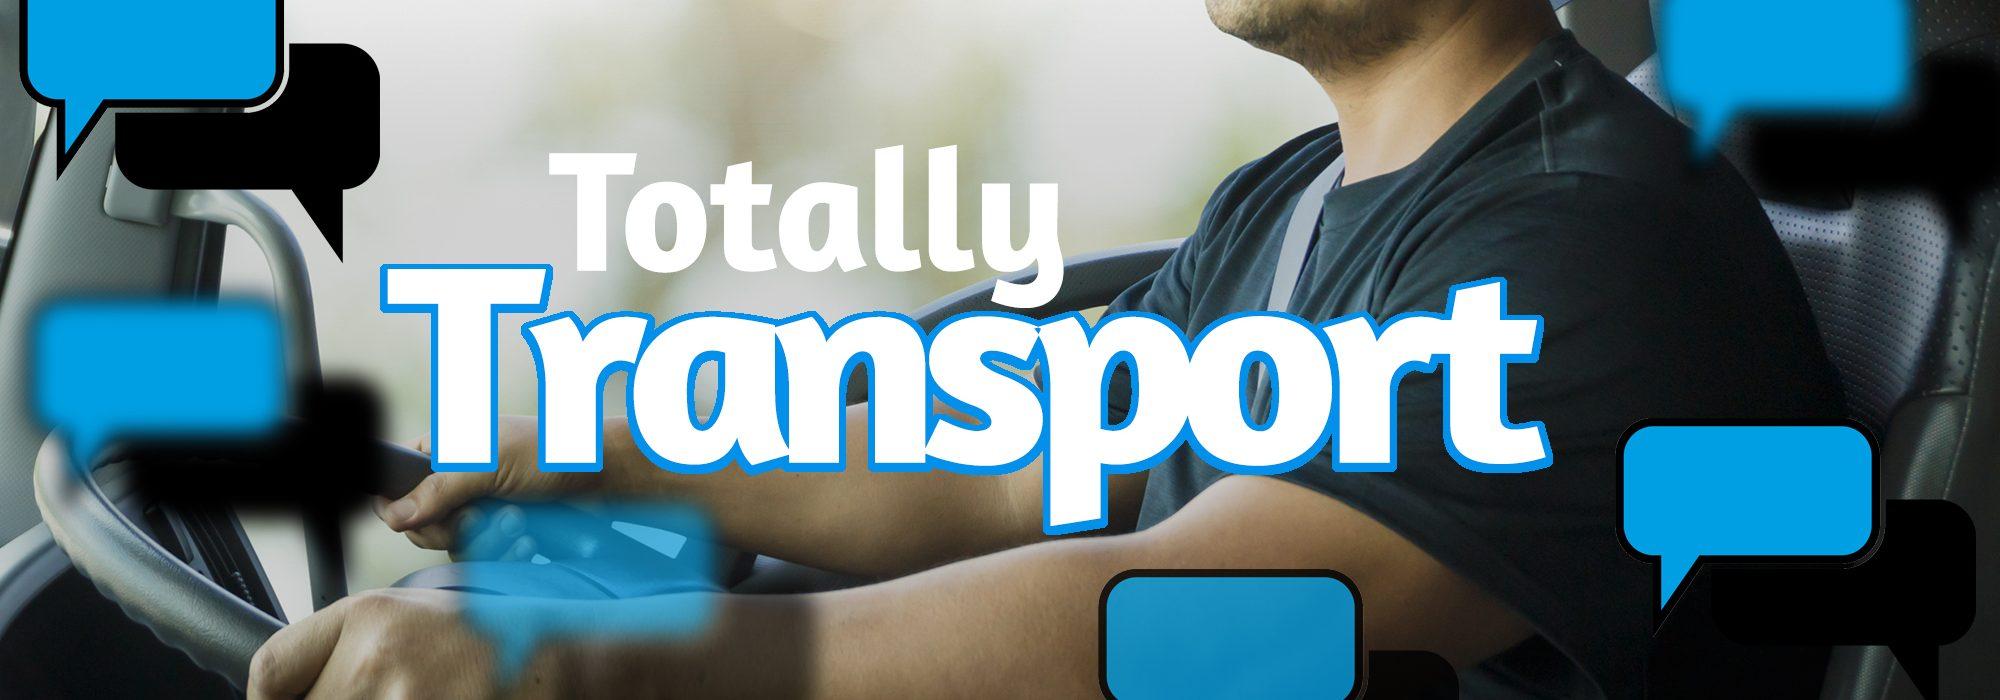 Totally Transport